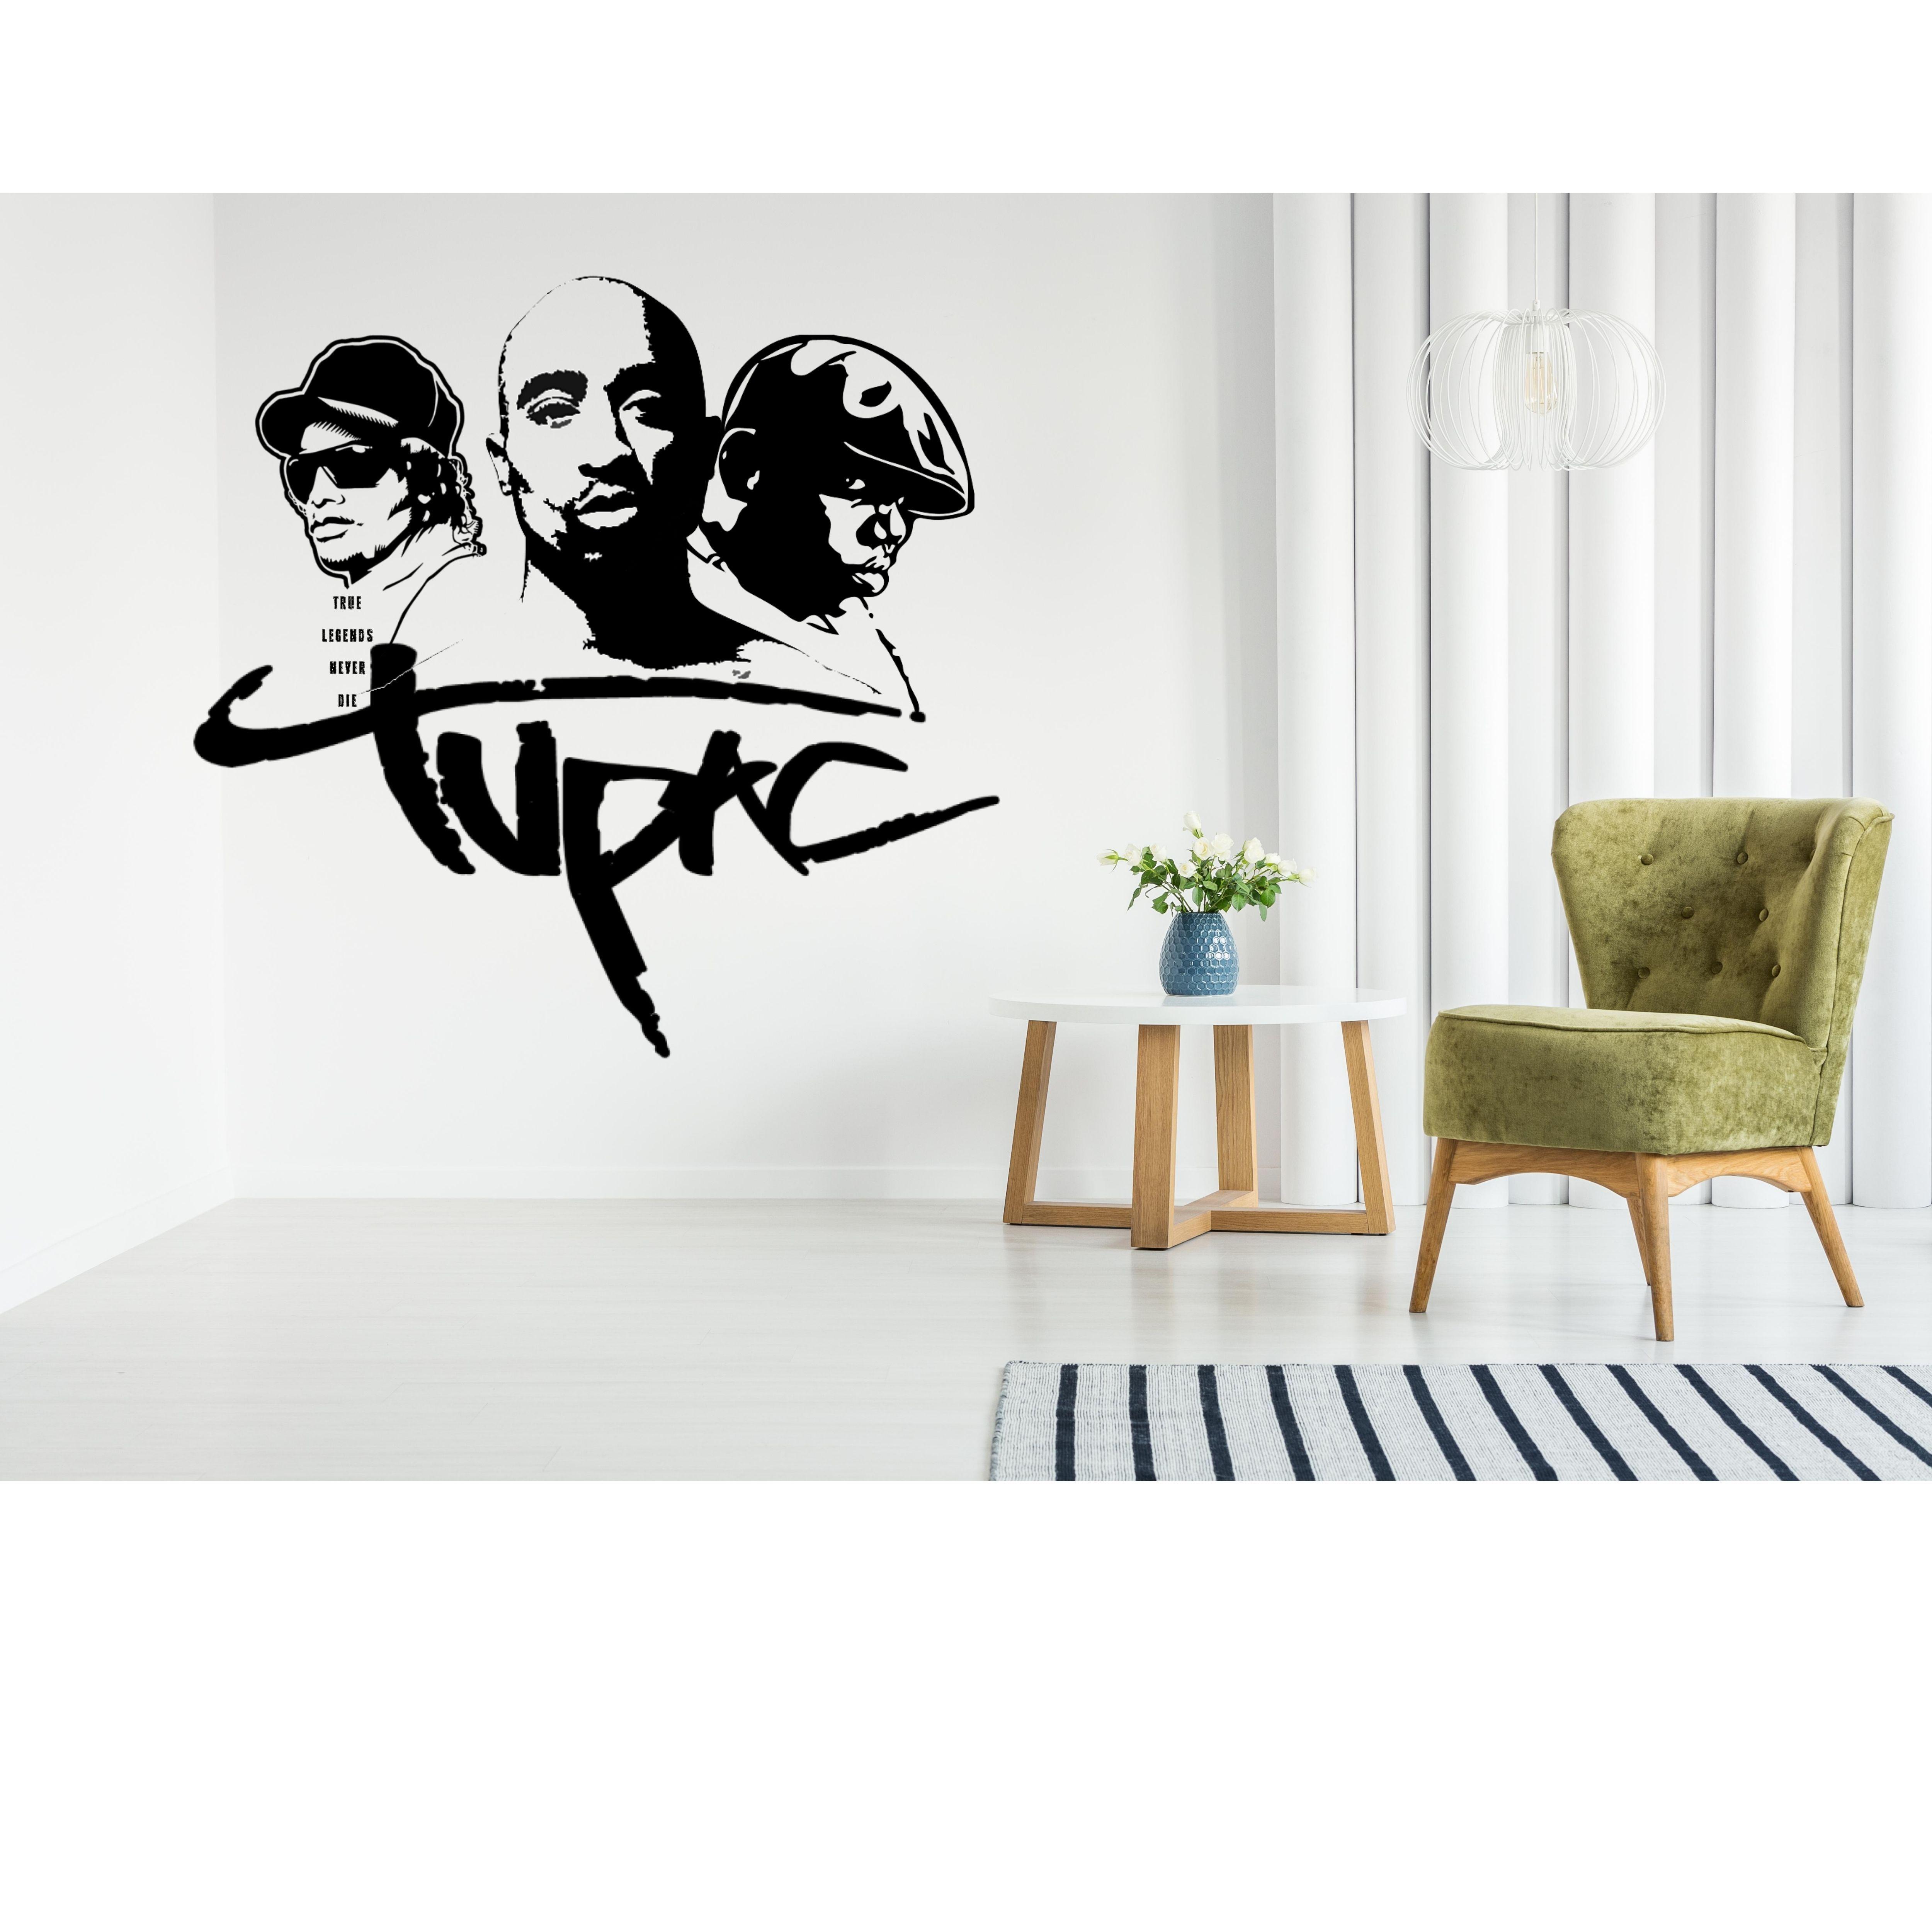 2pac Notorius Big Easy E 90s Hip Hop Legend Window Vinyl Fashion Living Room Sticker Home Wall Decor Home Wall Decor Room Stickers Window Vinyl [ 5000 x 5000 Pixel ]